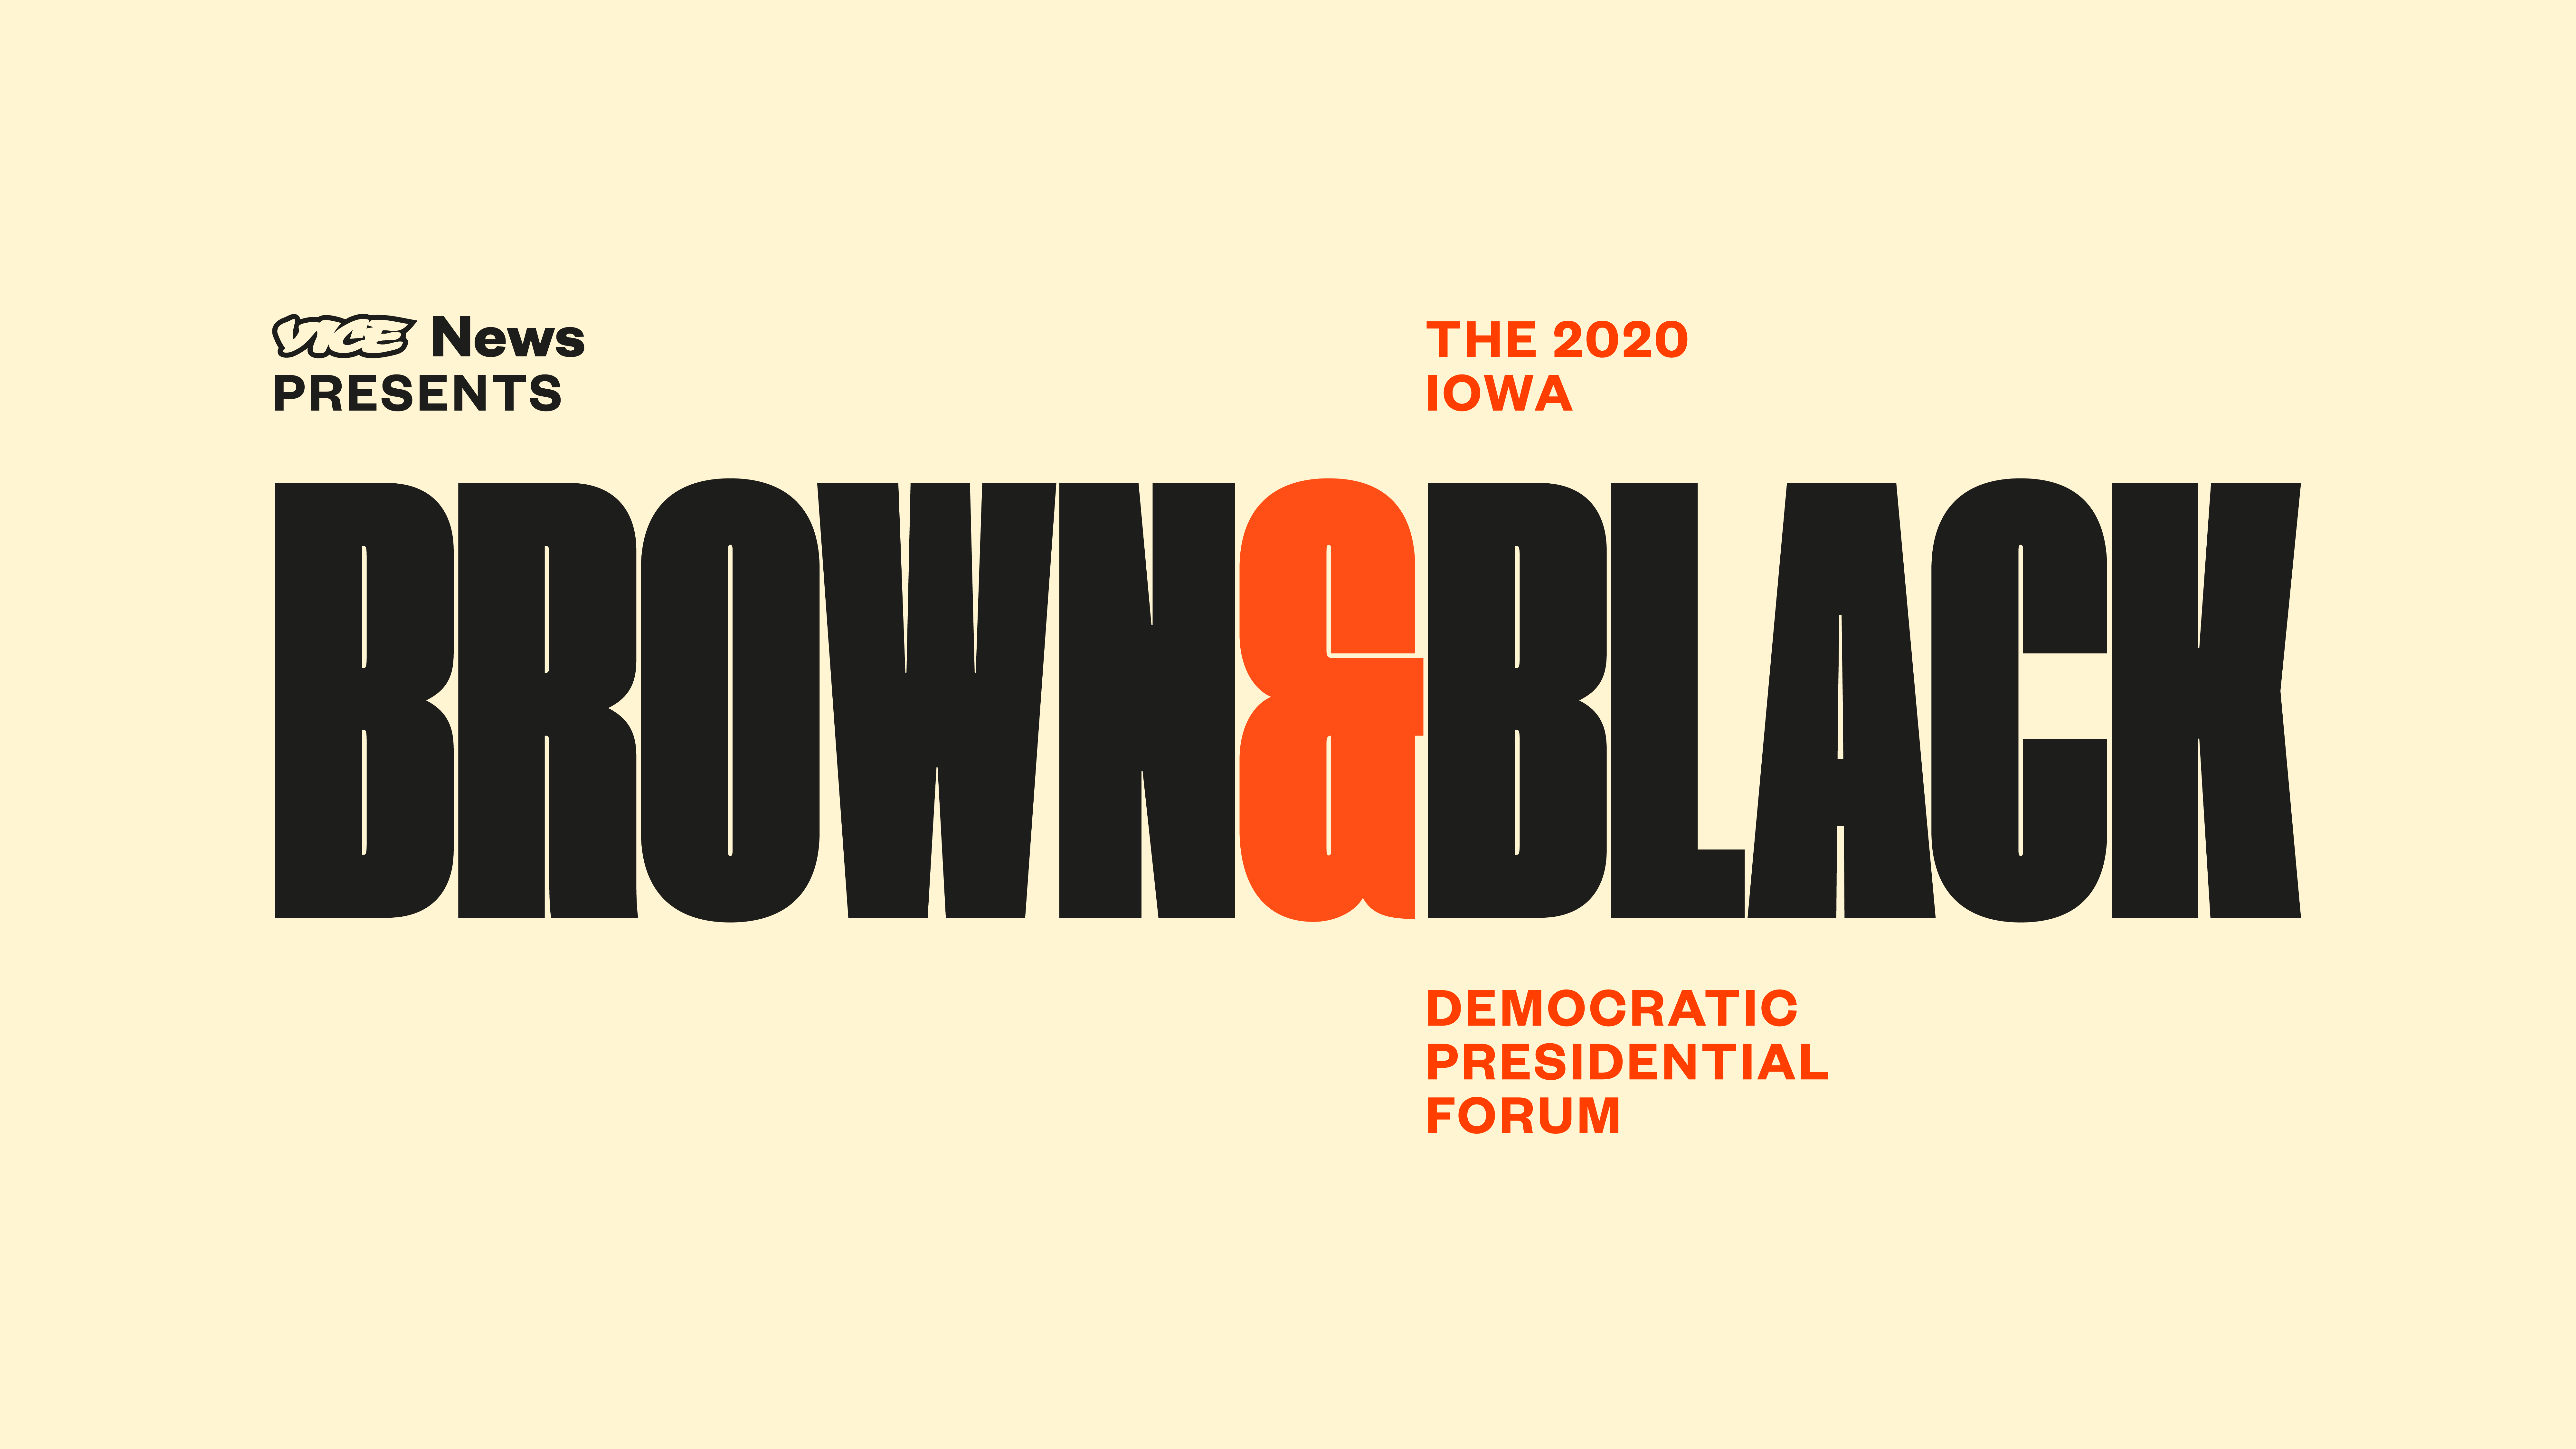 , VICE News to Broadcast the 2020 Brown & Black Democratic Presidential Forum Jan. 20, Saubio Making Wealth